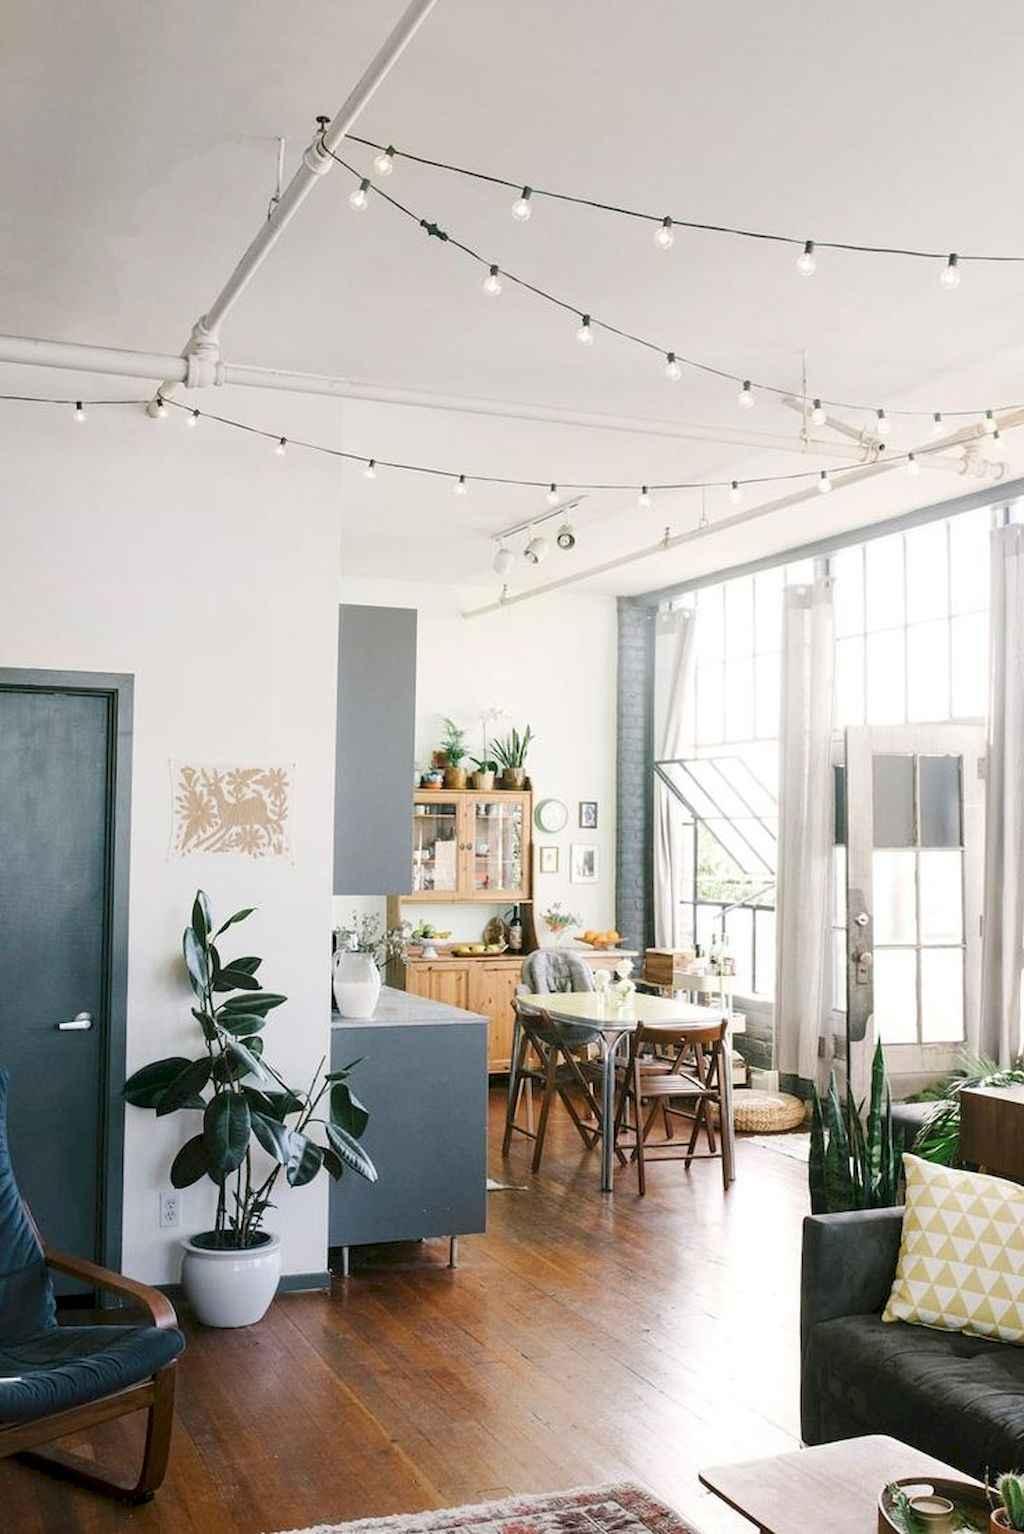 Cool creative loft apartment decorating ideas (63)